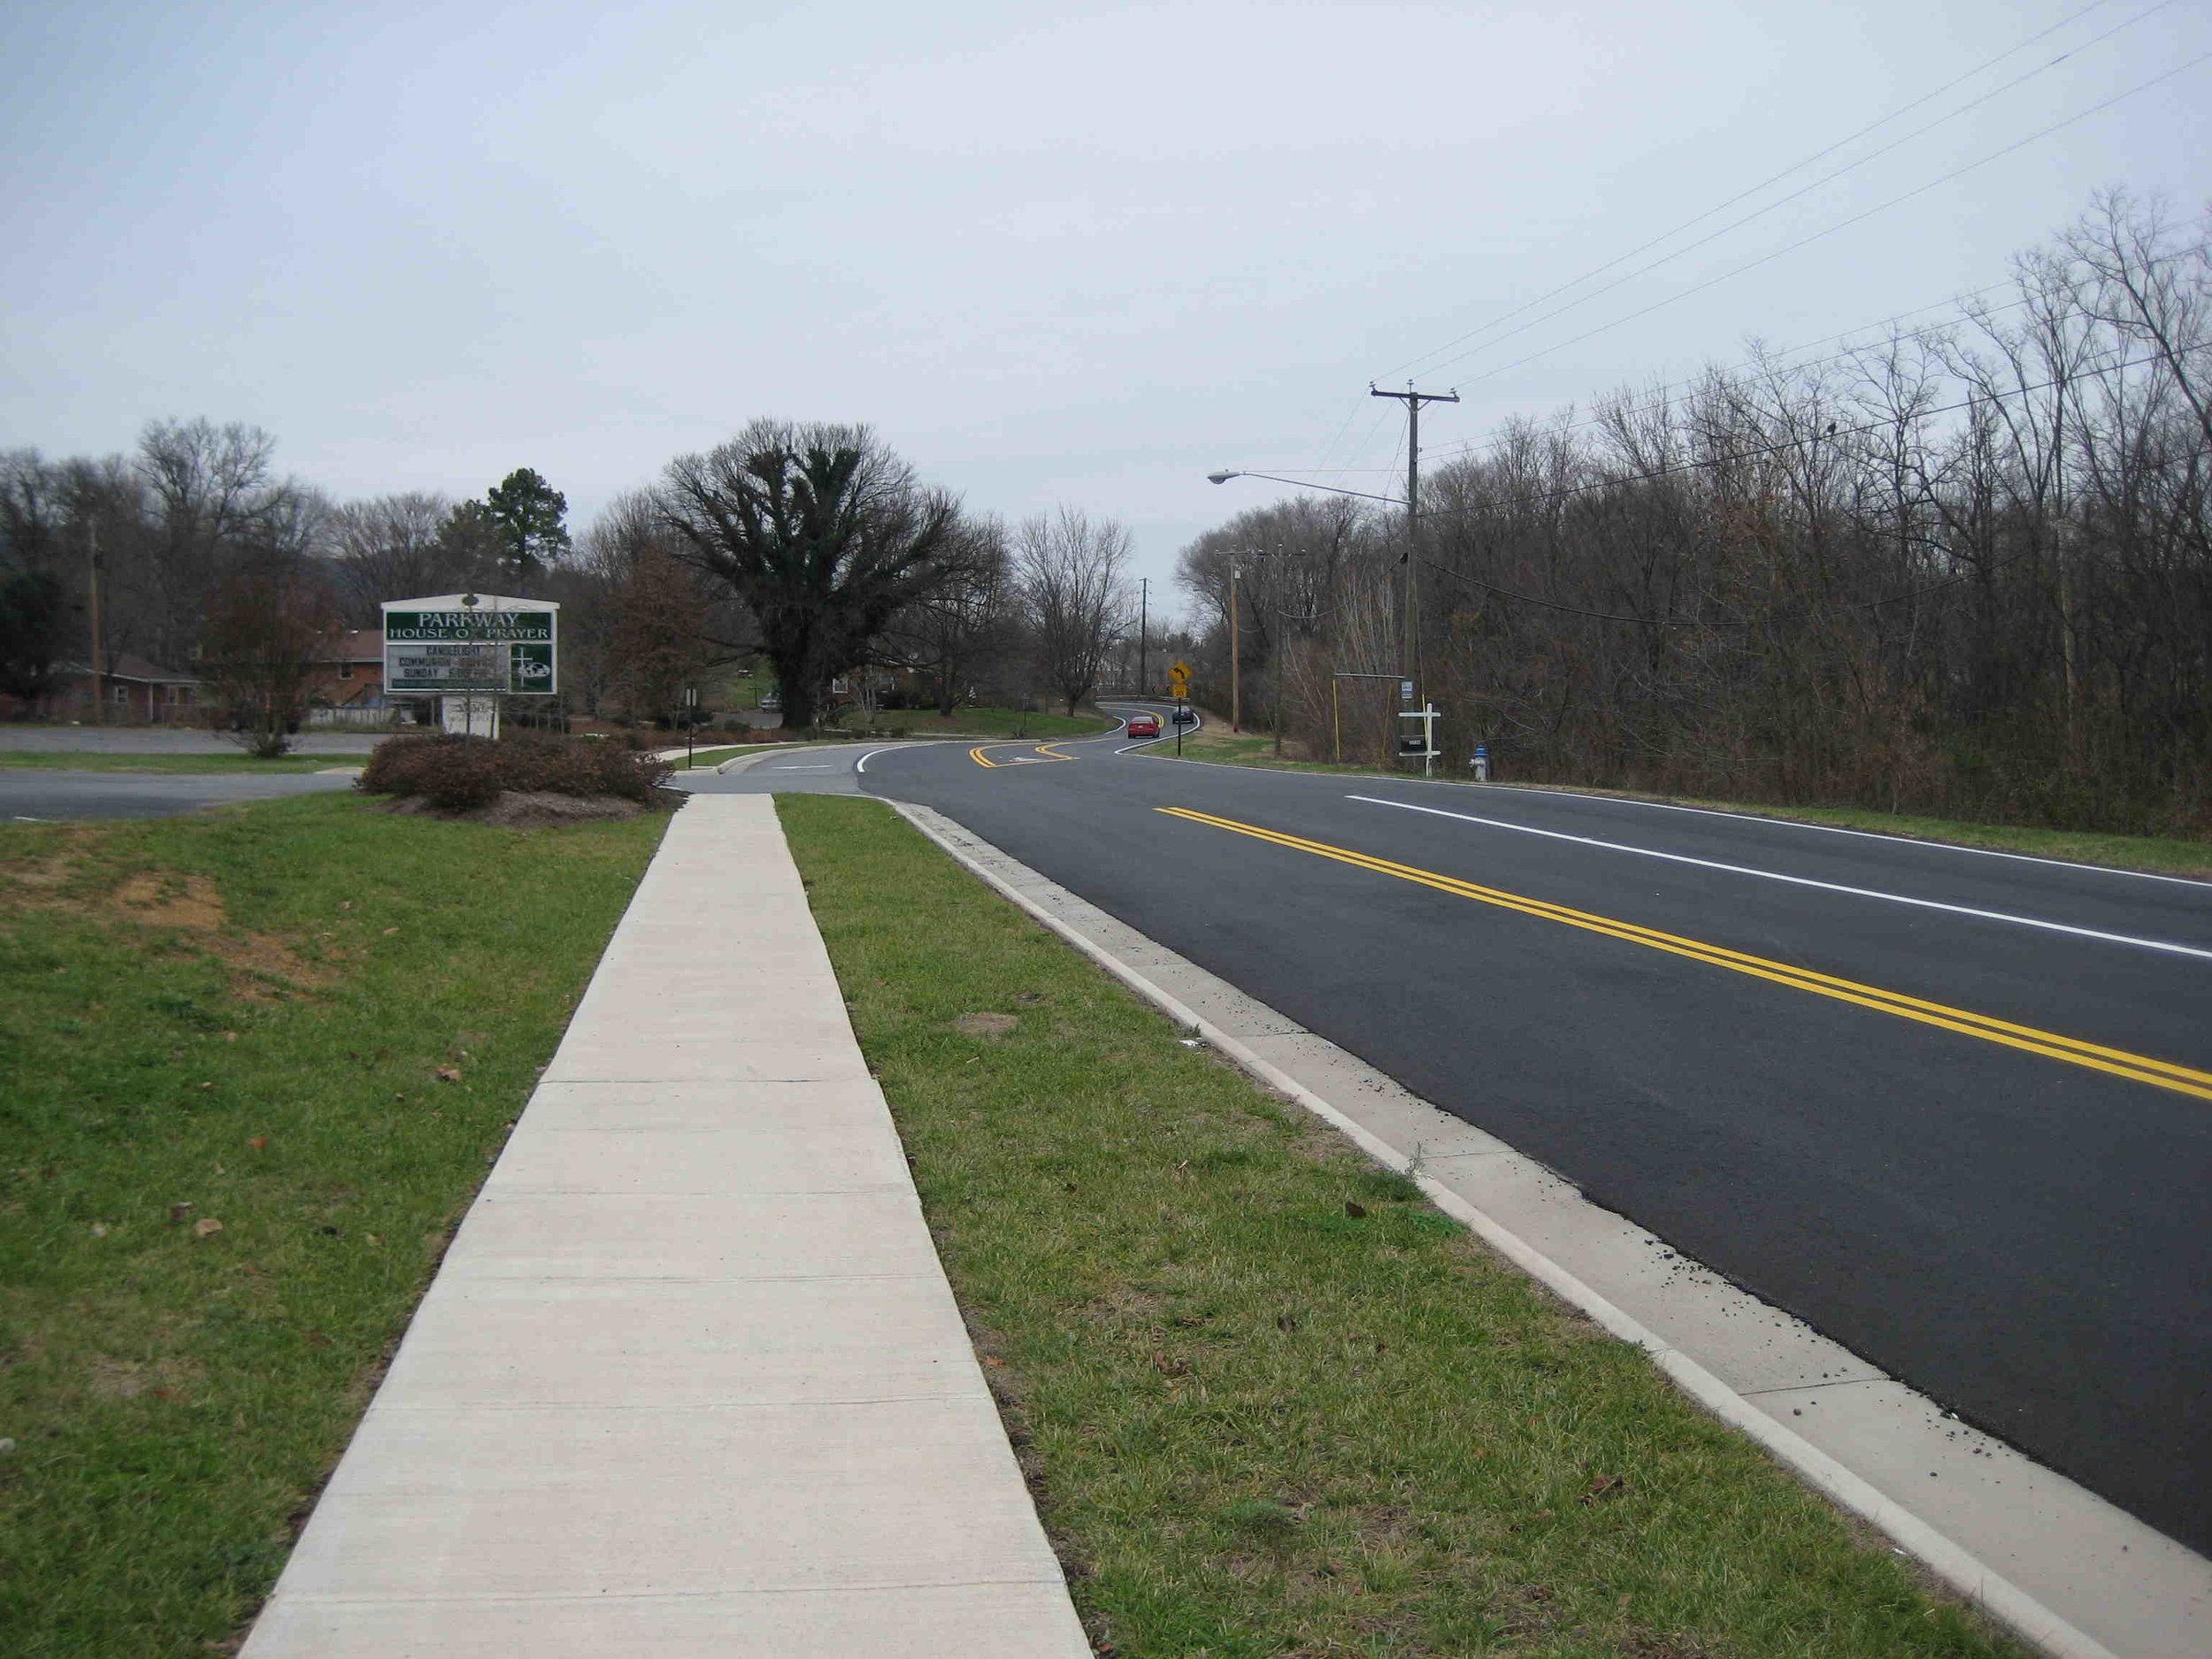 kingstreetimprovements-12142011.jpg